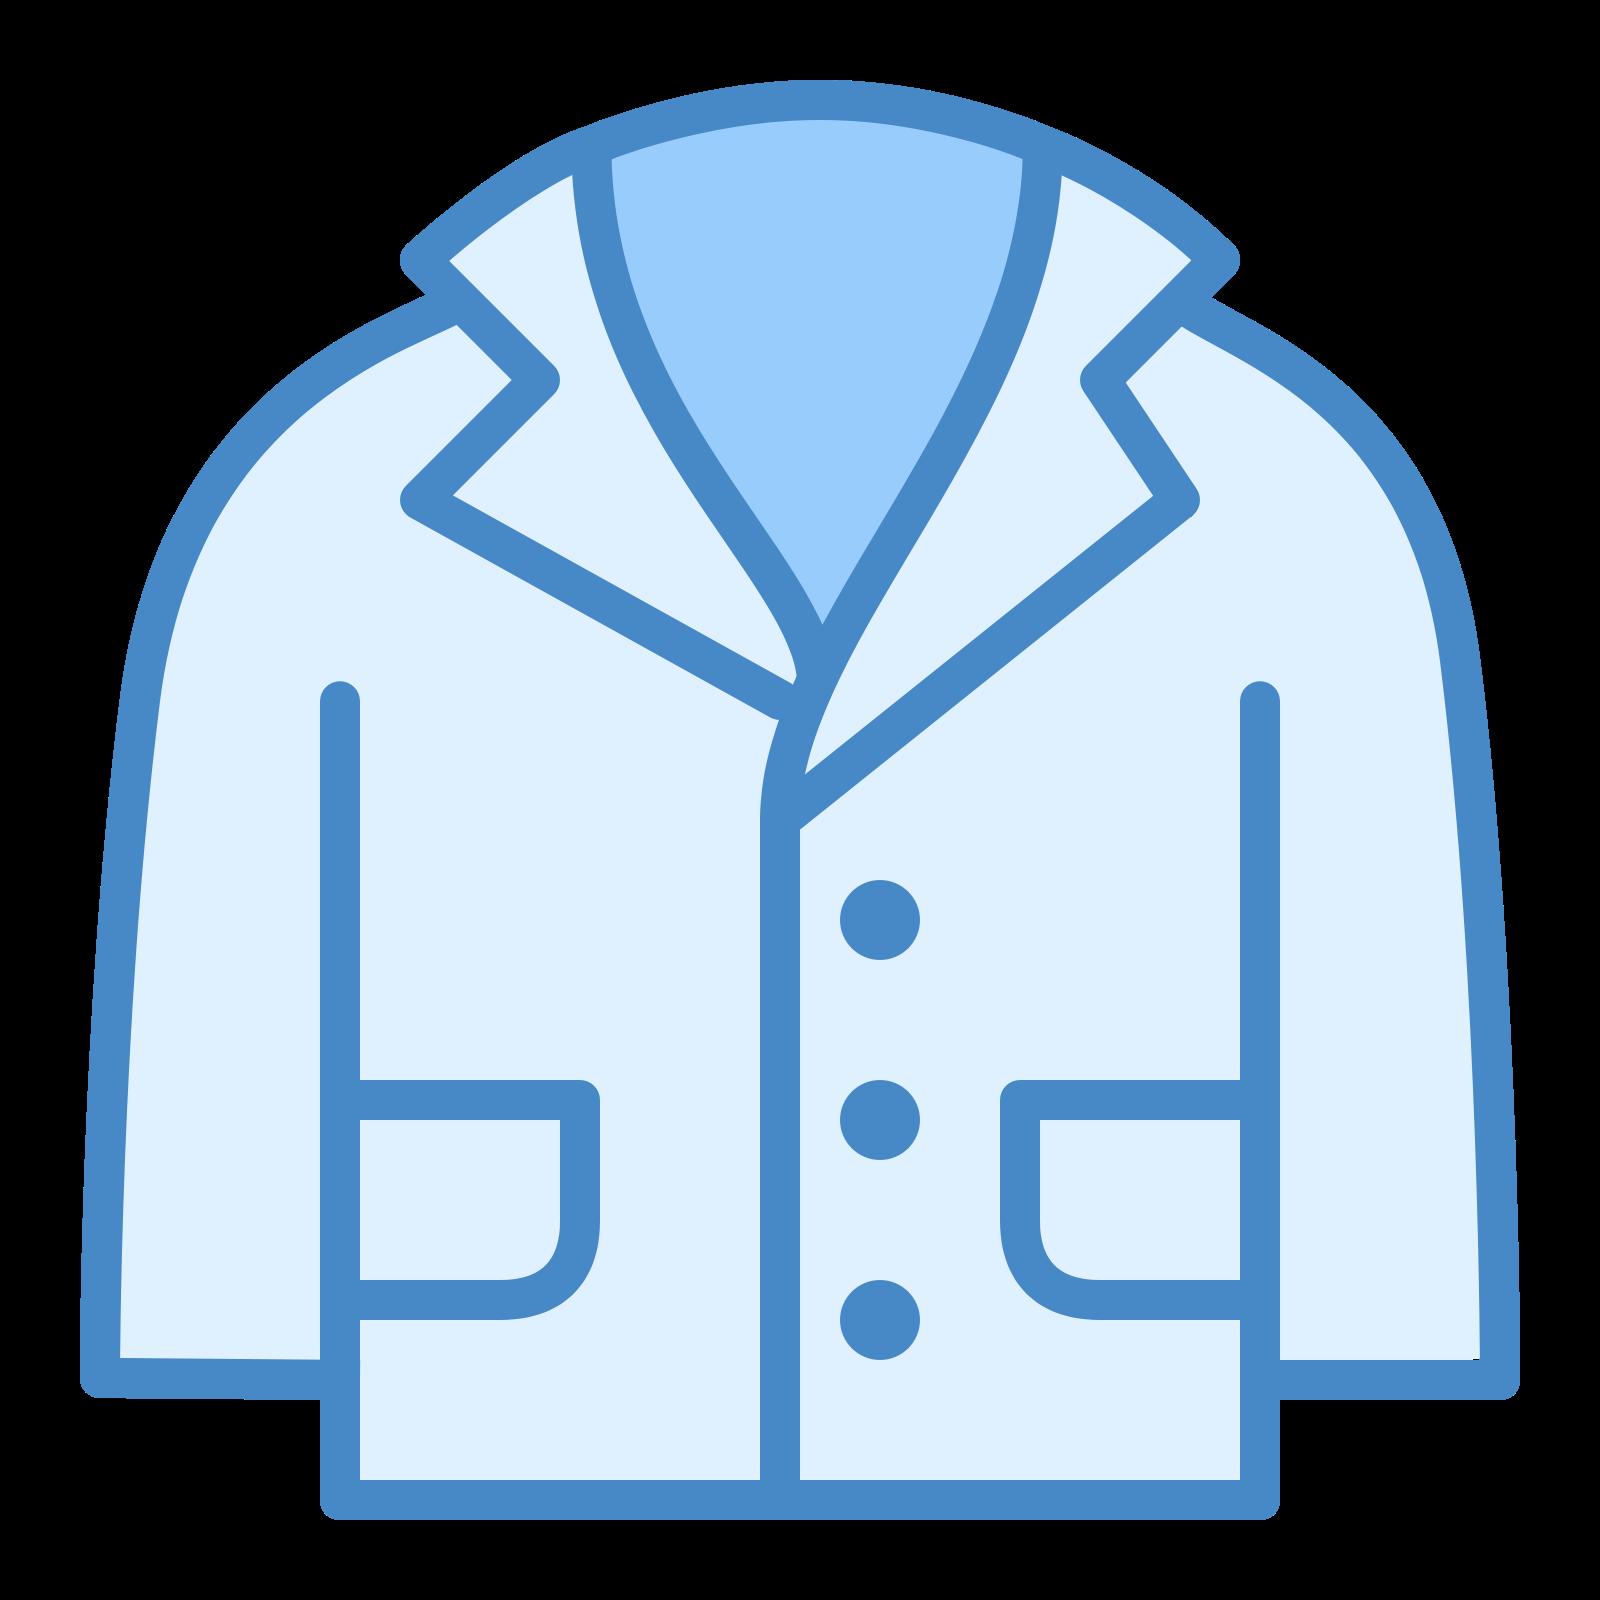 Doctor clipart coat. Png wear transparent images